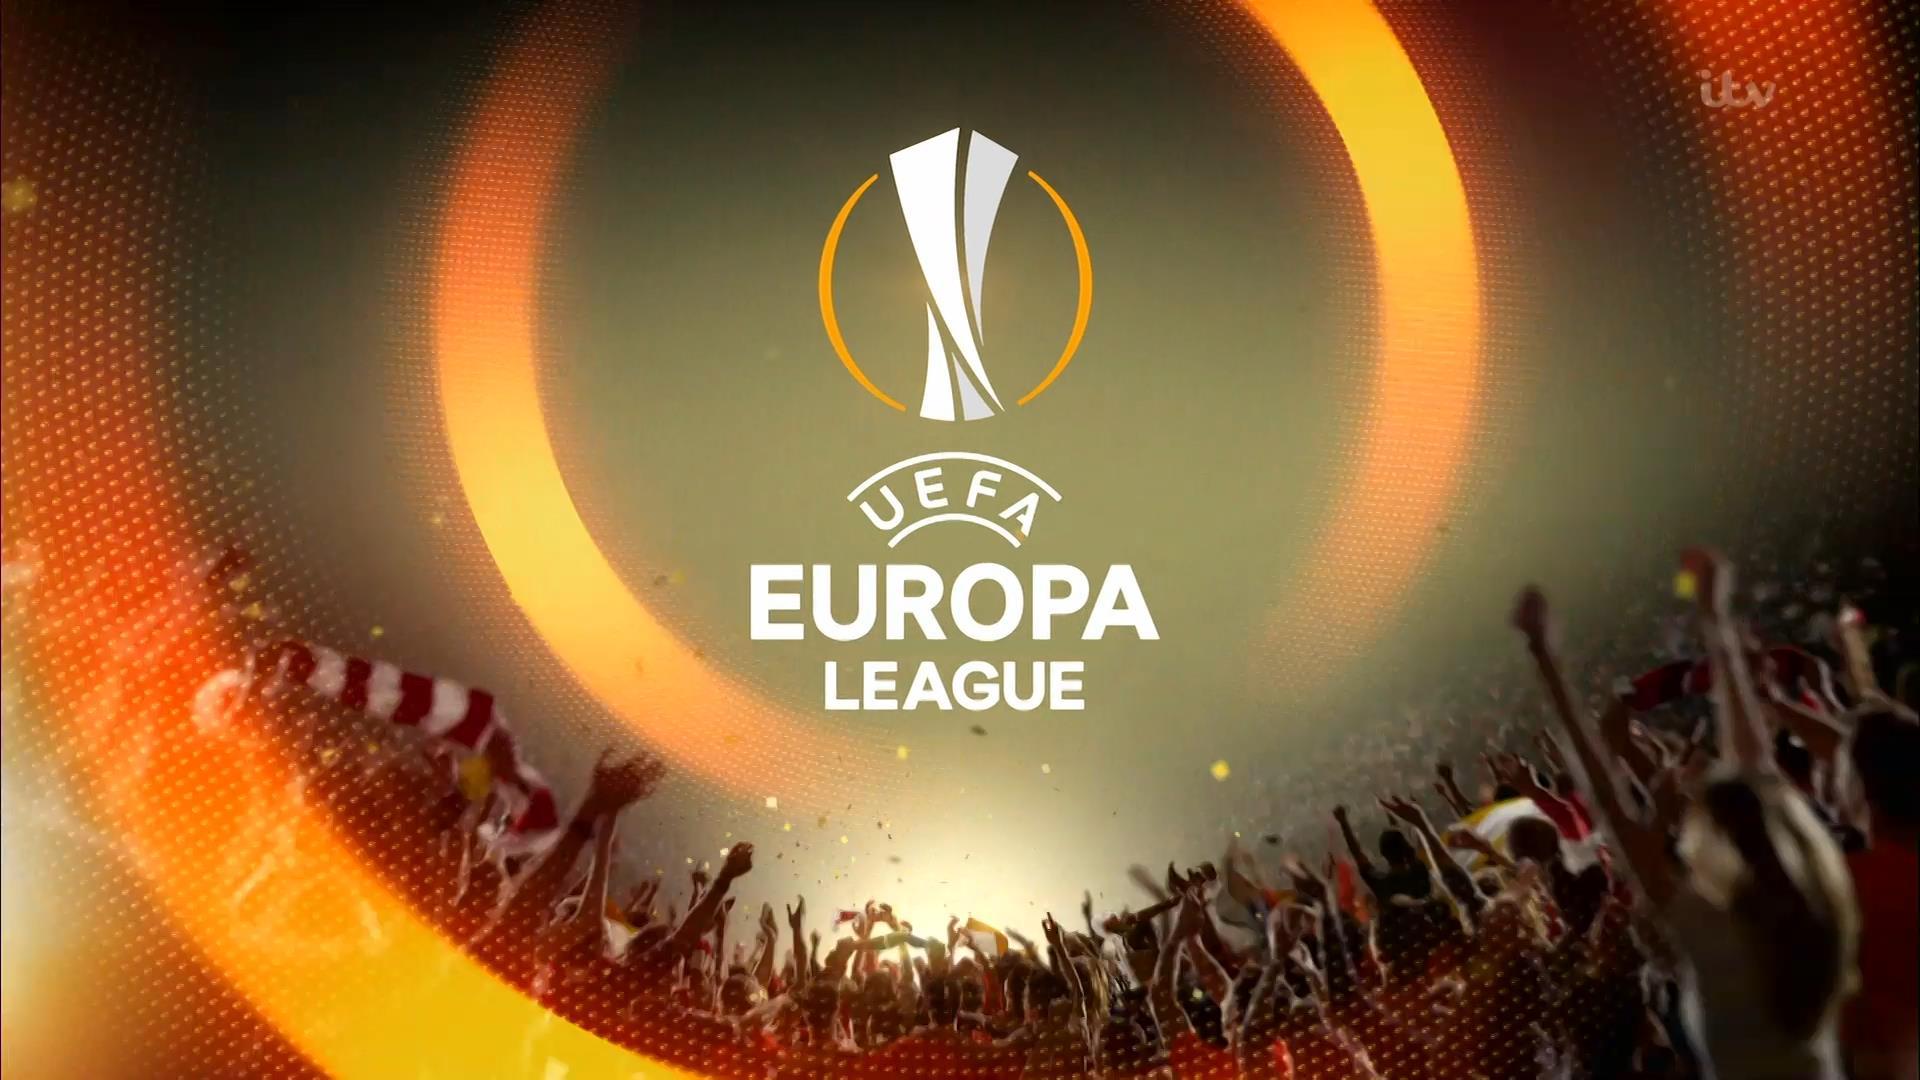 Europa League: Europa League Soccer Sports Wallpaper